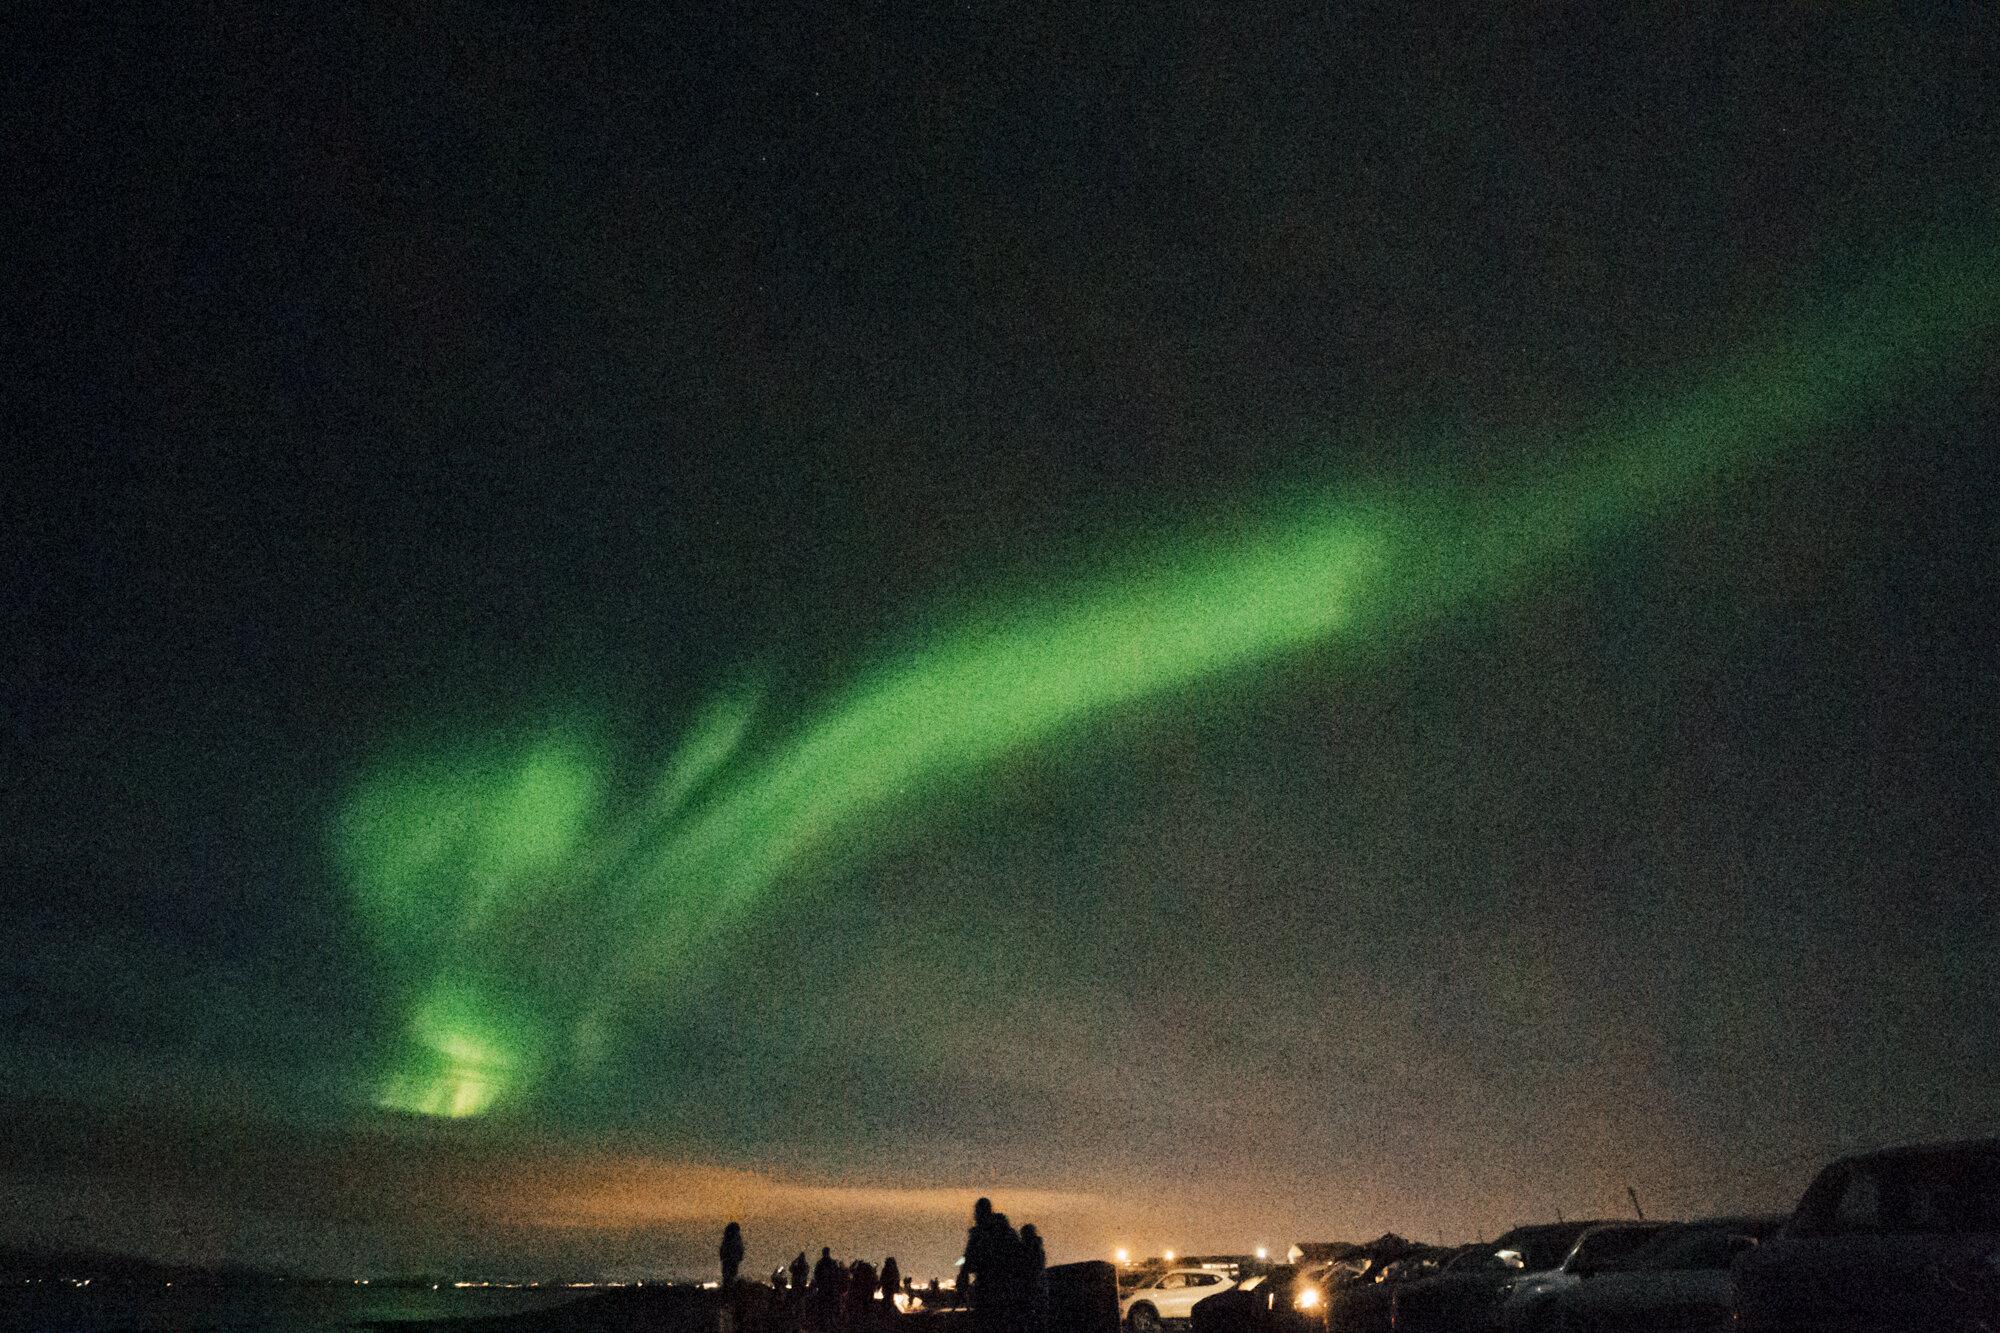 Aurora Borealis的明亮的绿色条纹在夜空的夜空在雷克雅未克,冰岛